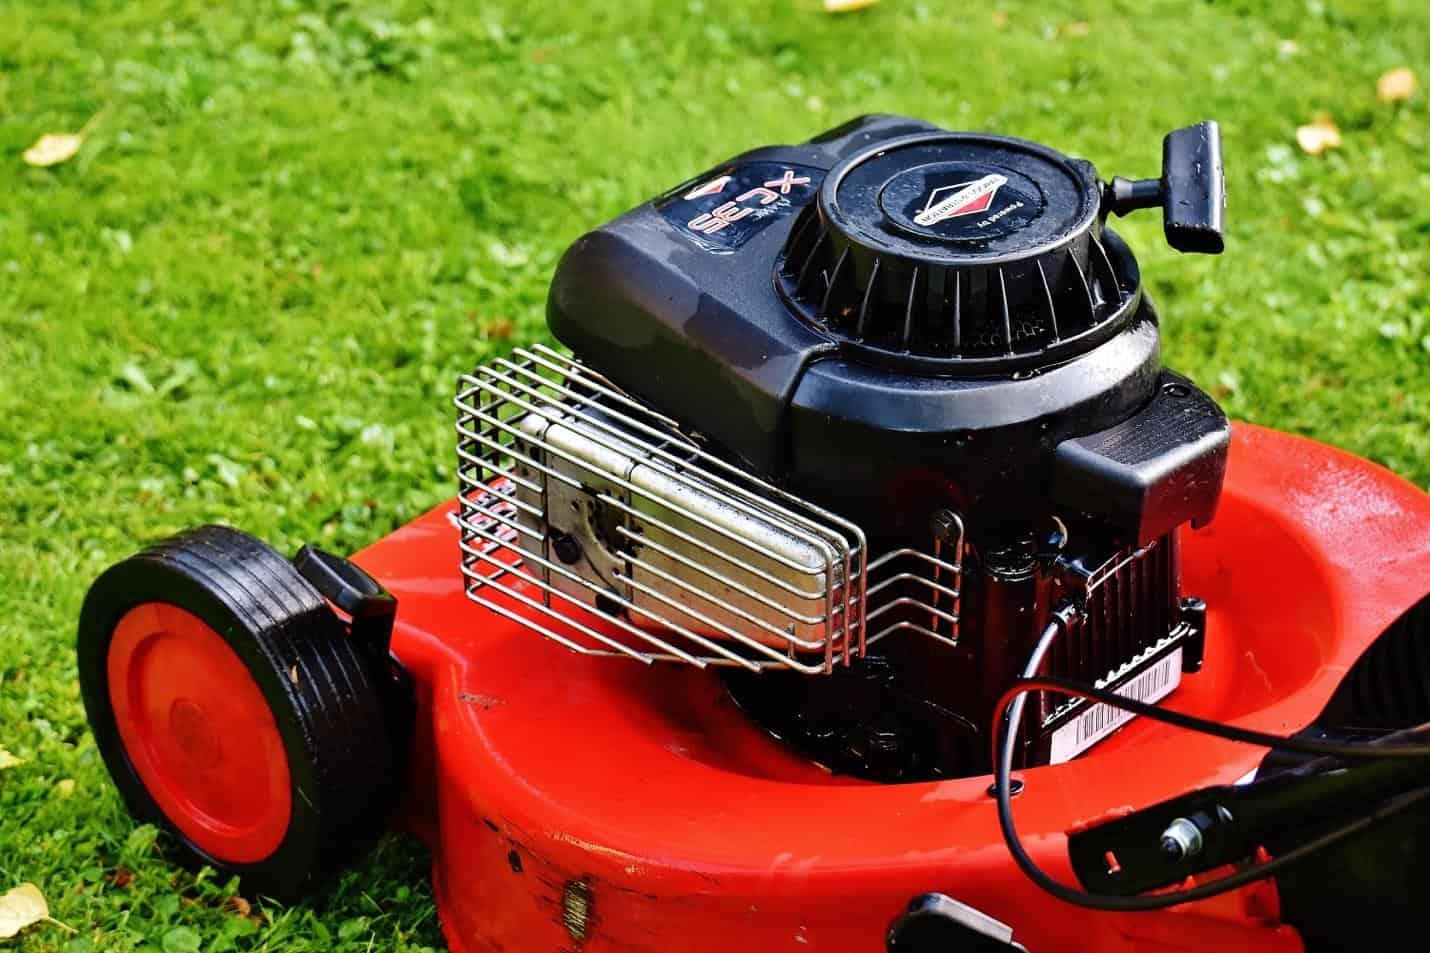 kohler lawn mower engine review